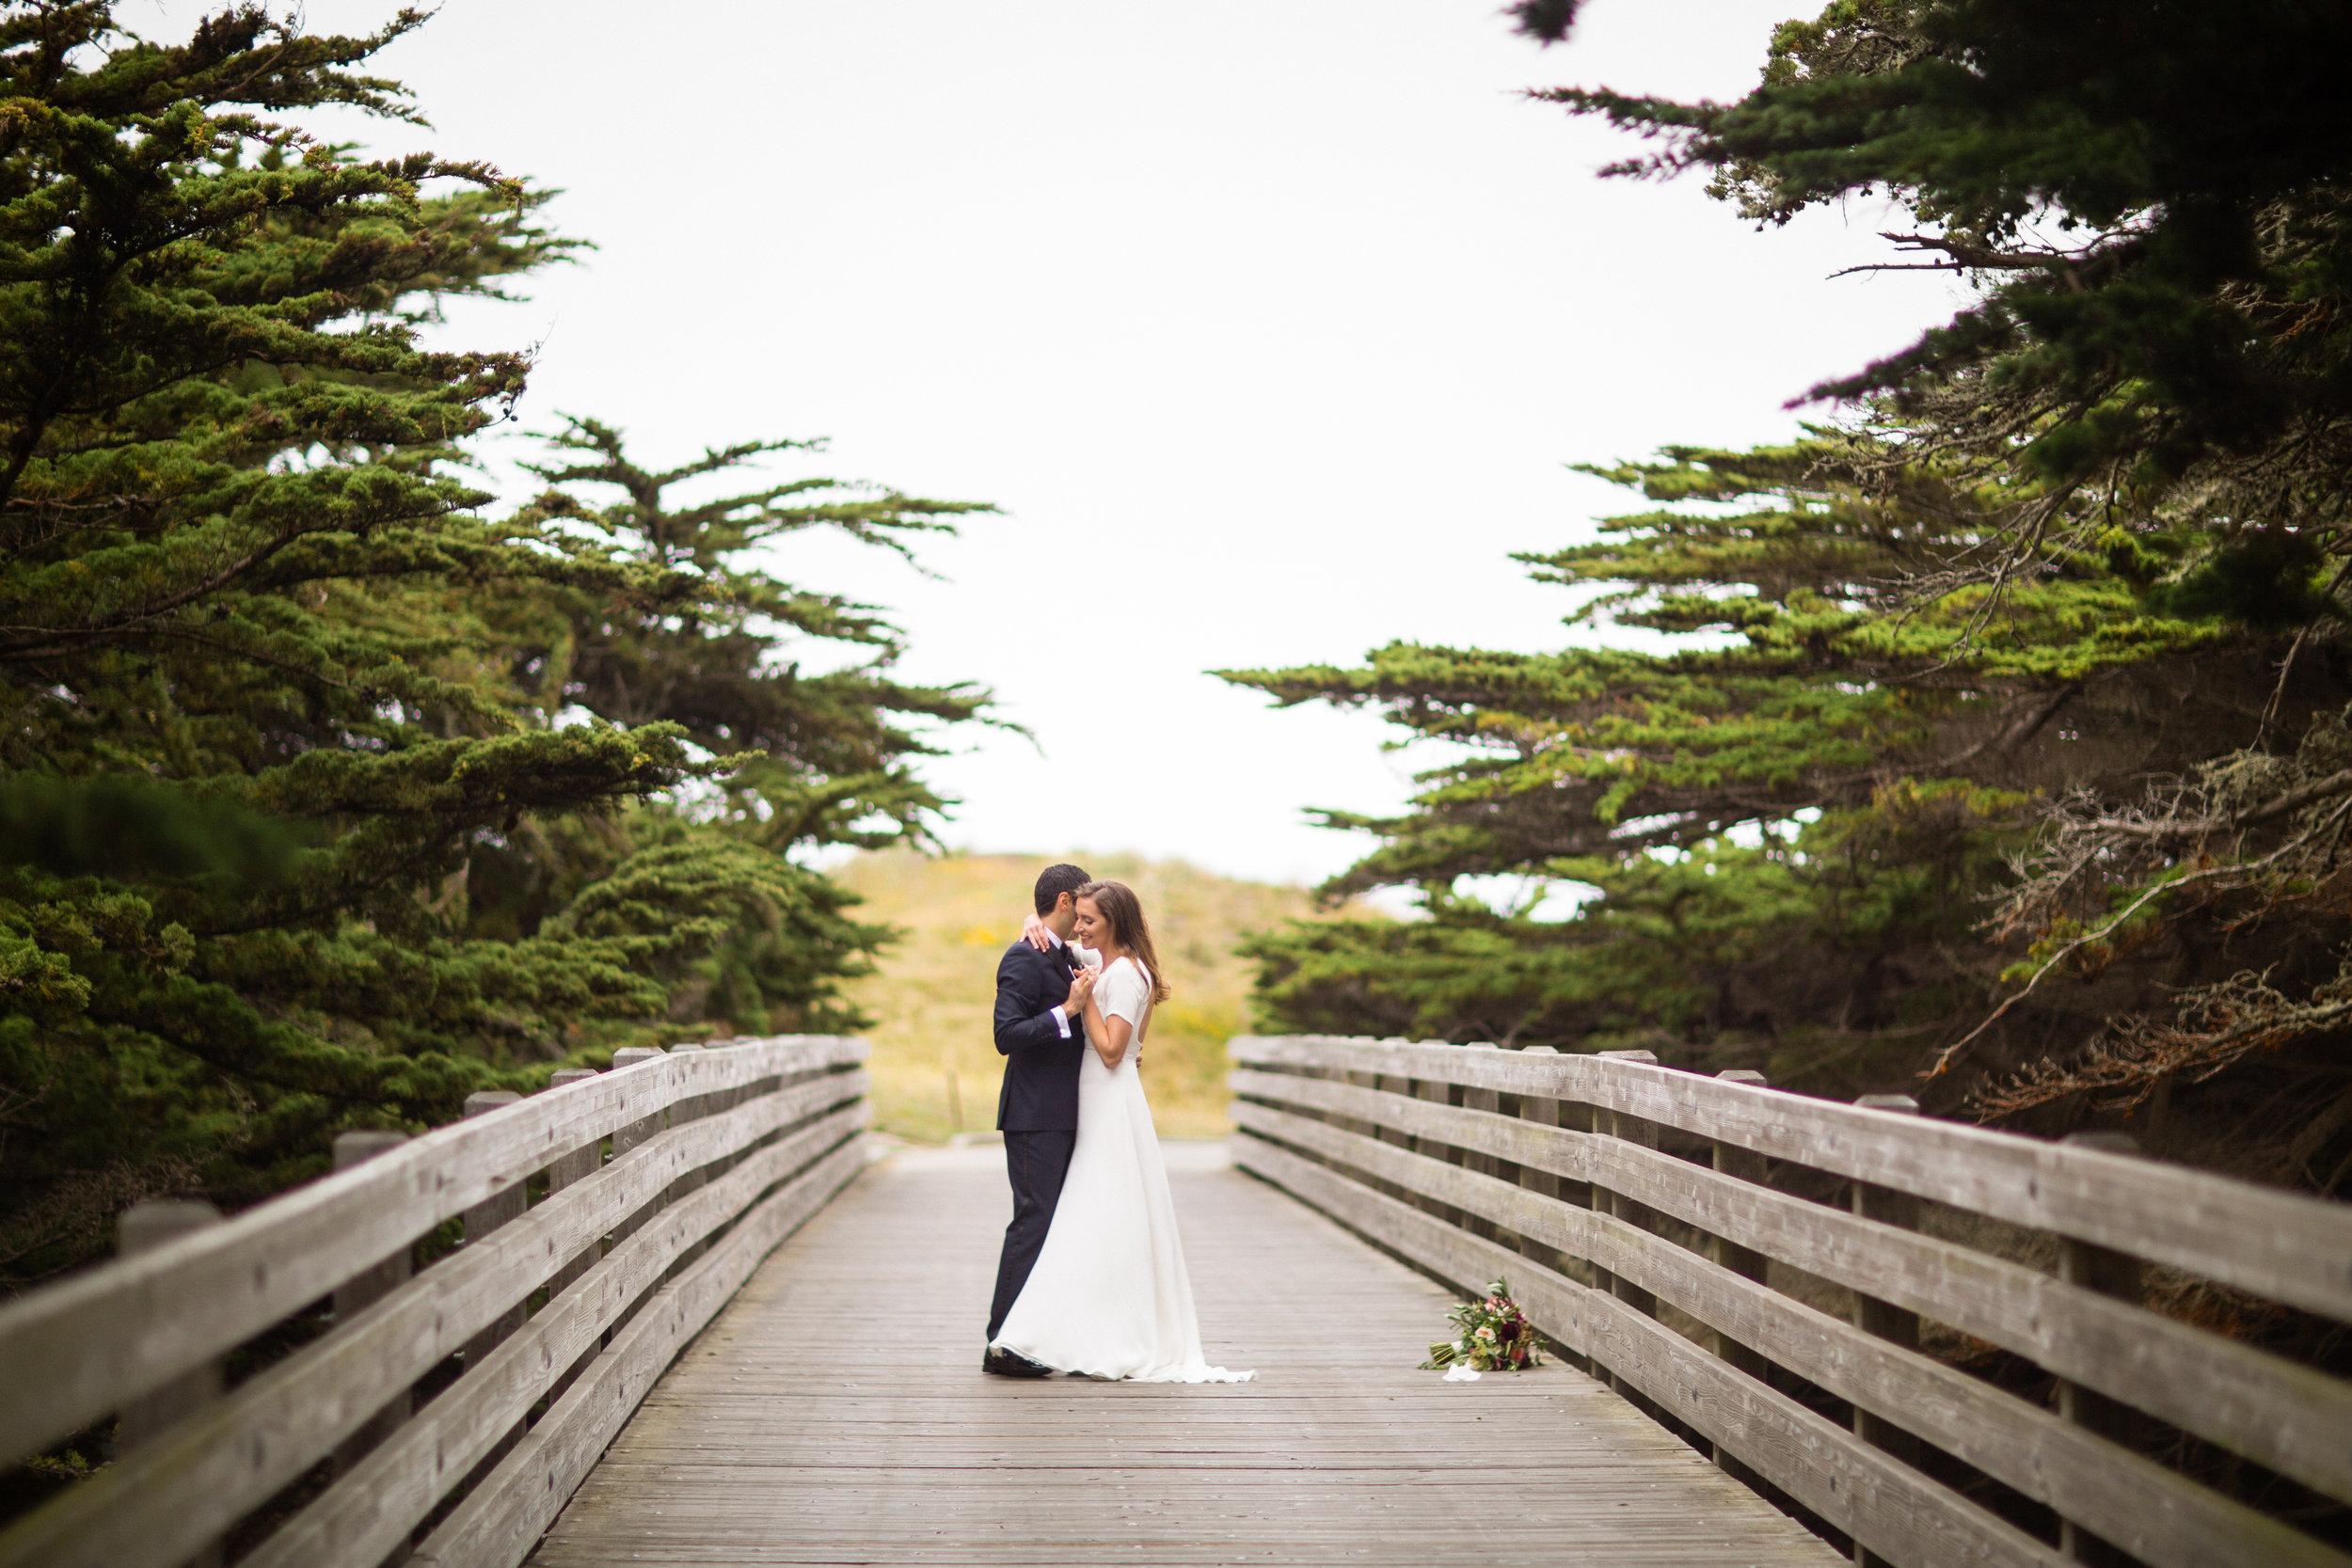 larissa-cleveland-sivanjeremy-wedding-0790-2.jpg